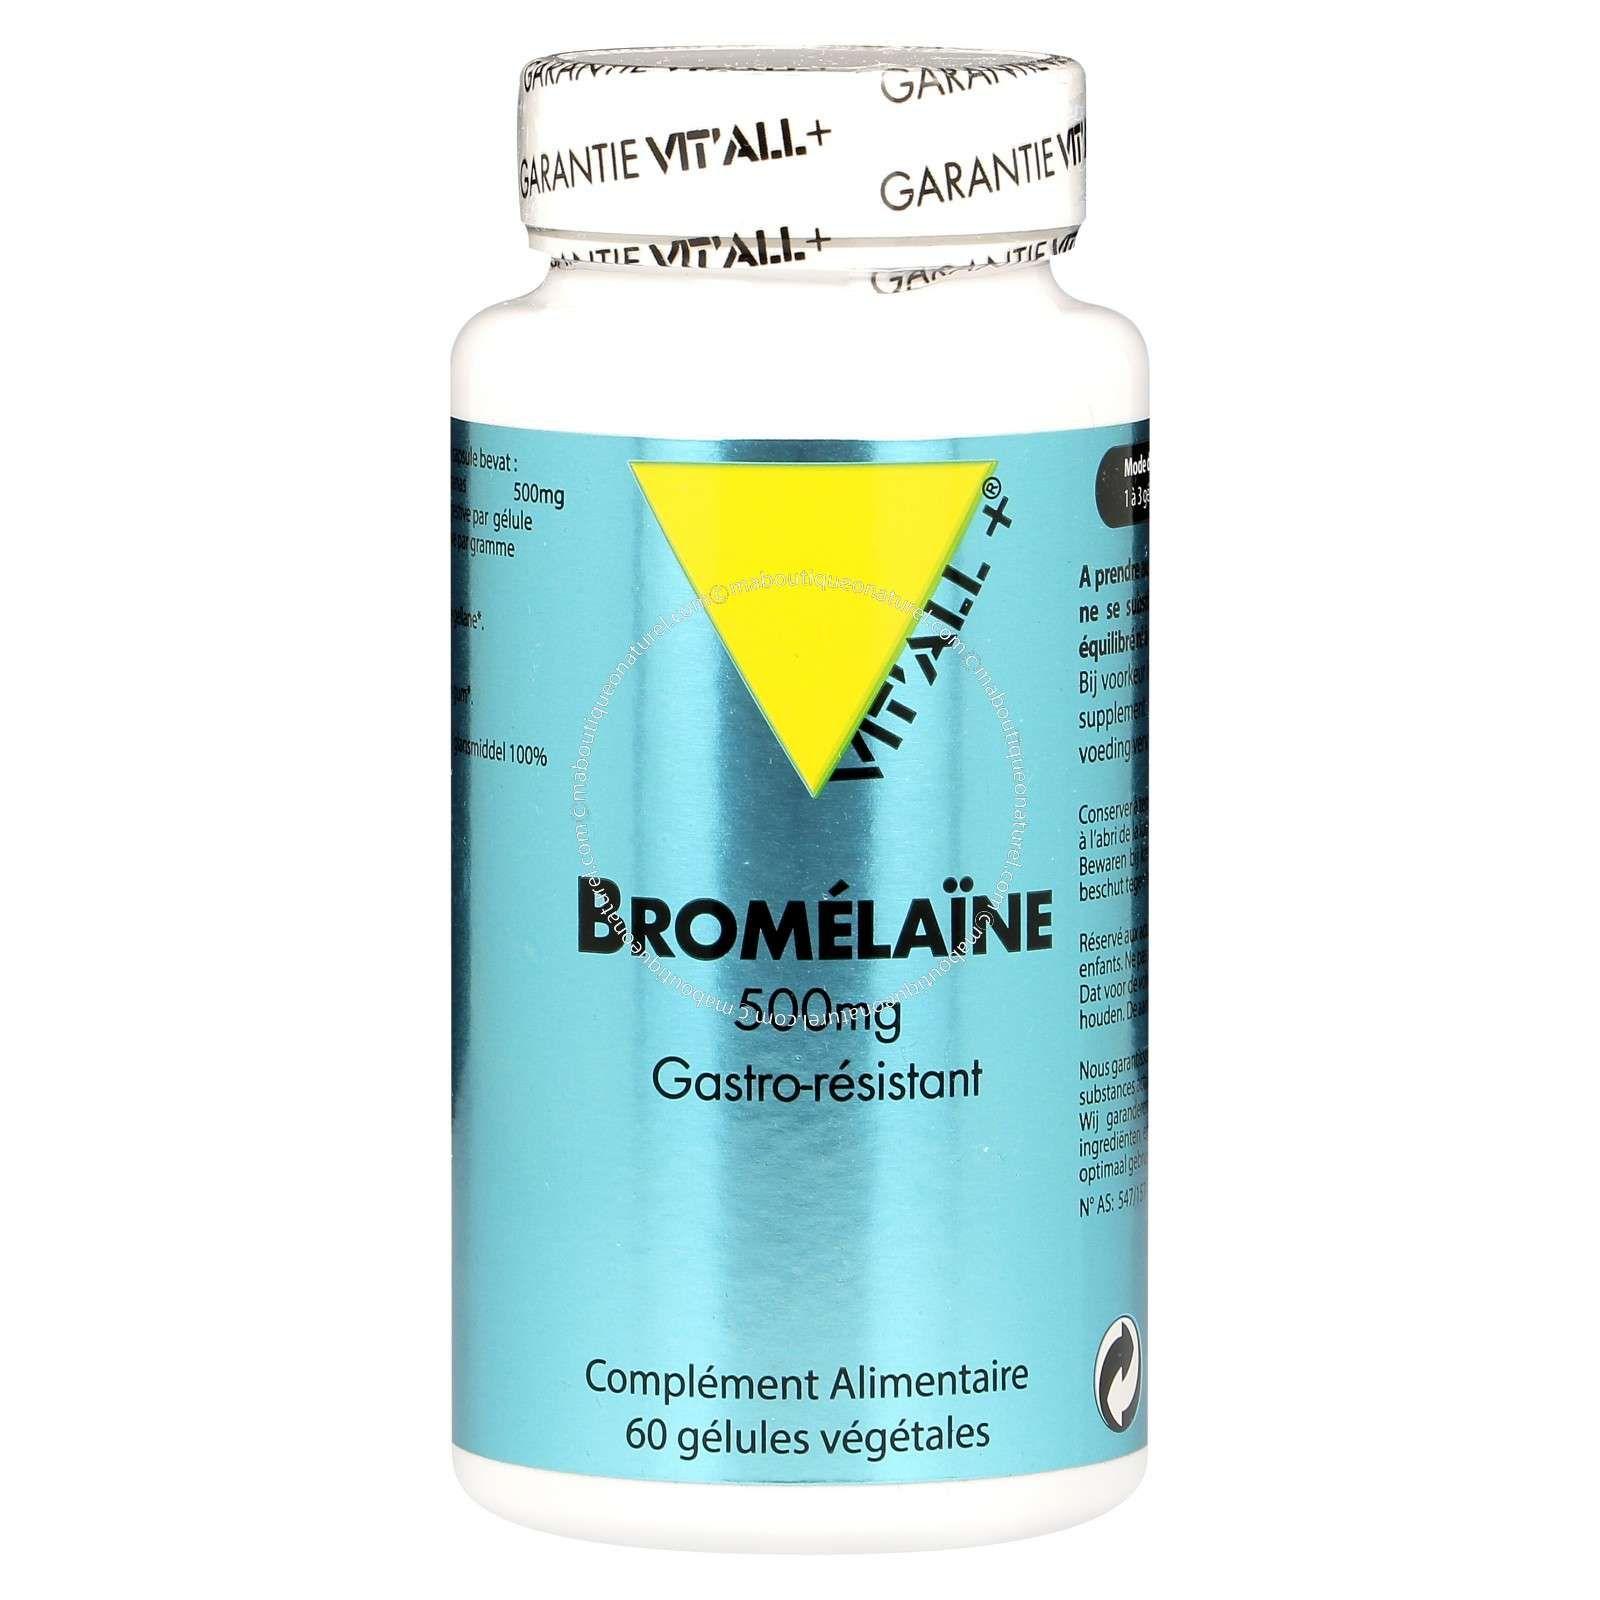 Bromelaïne 500mg - 60 capsules - Vitall+ - Onatera.com ...